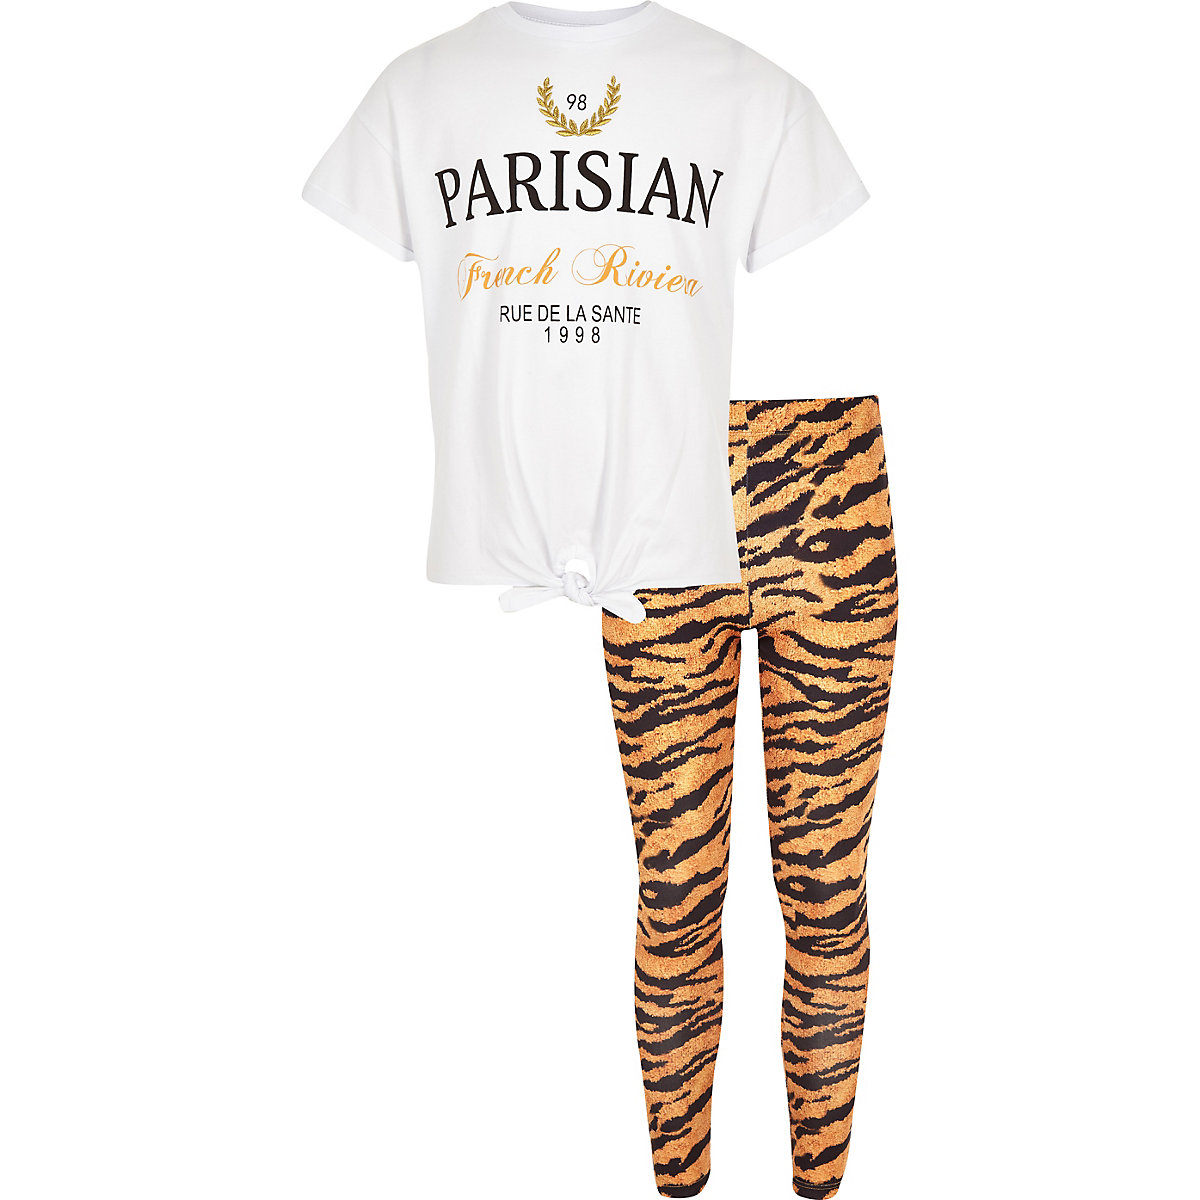 Girls white 'Parisian' T-shirt outfit